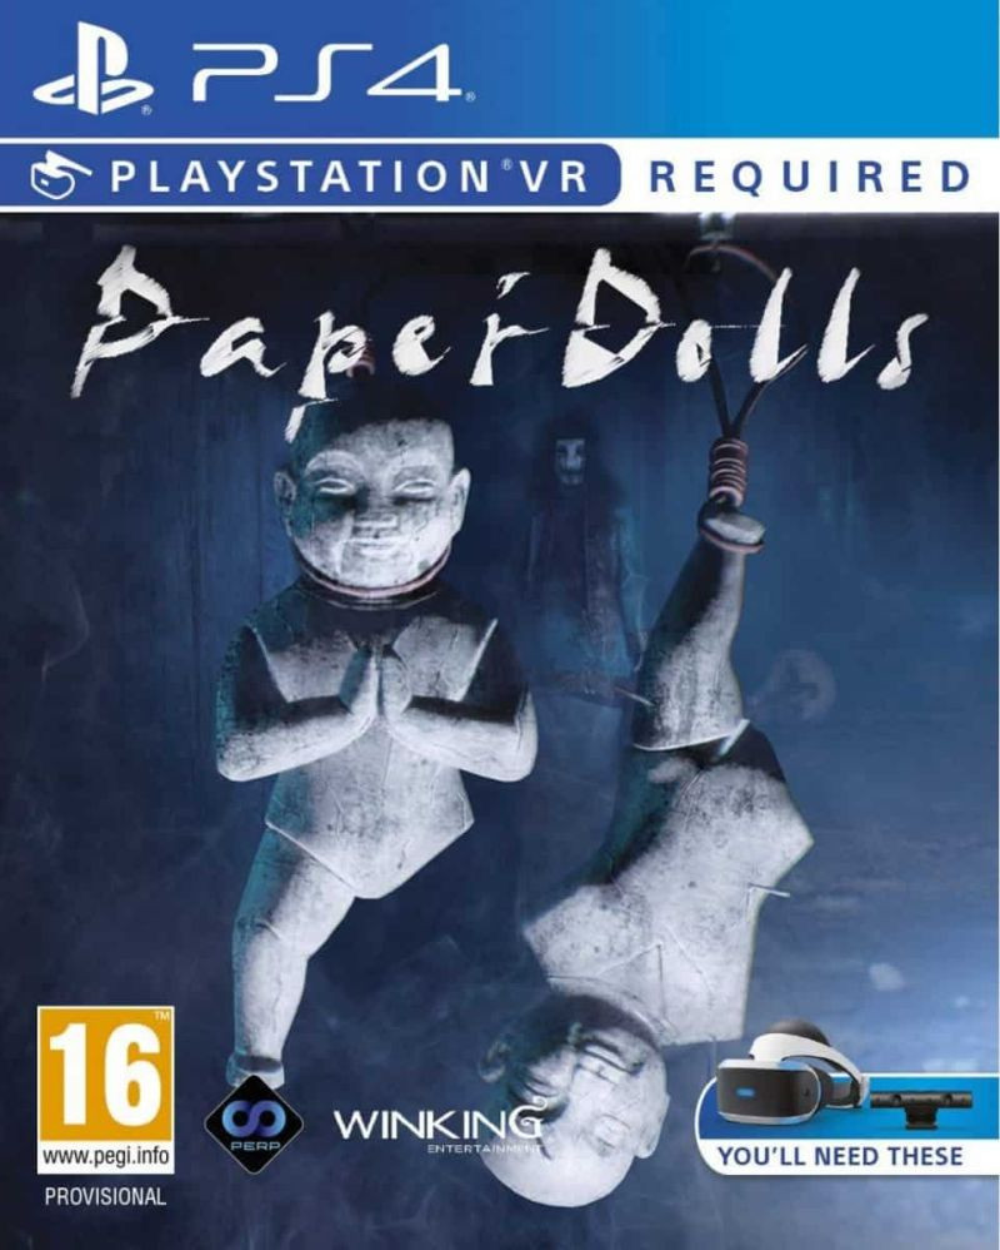 PS4 Paper Dolls VR